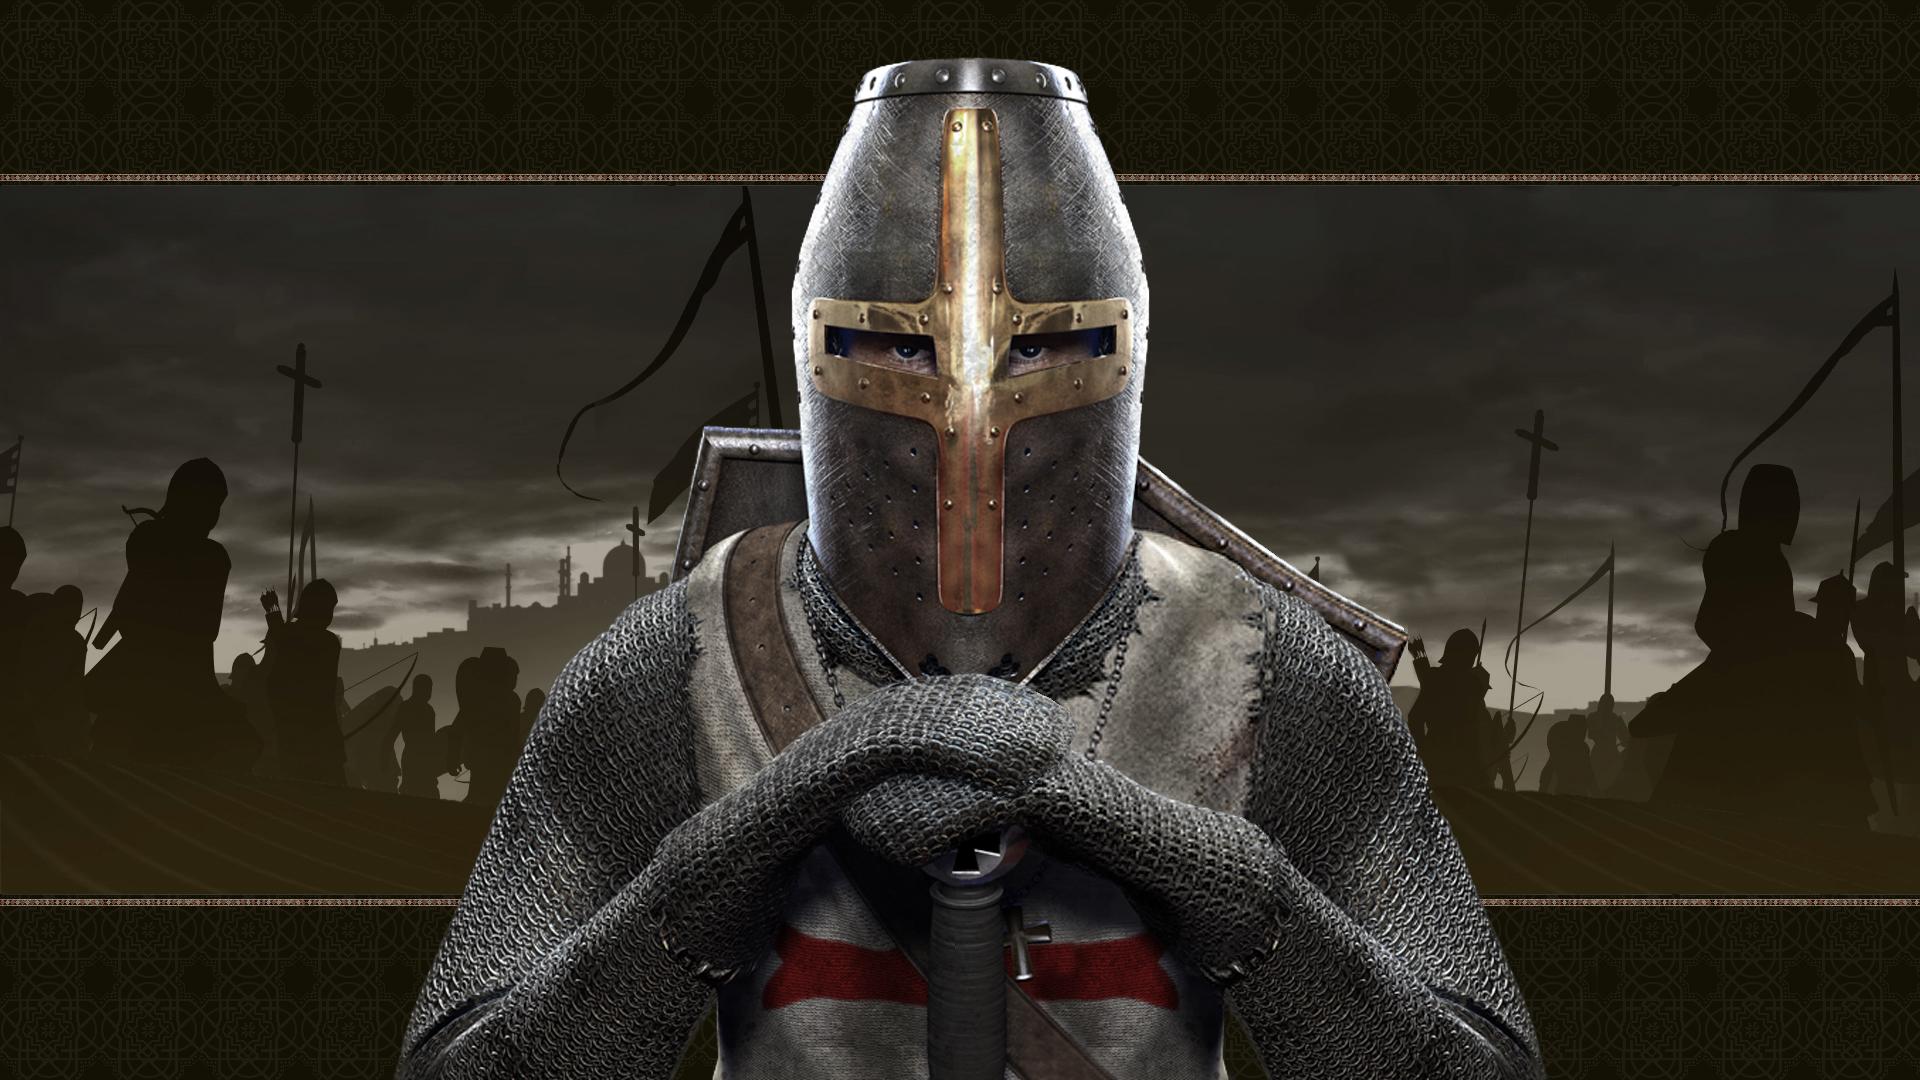 Crusader Knight Computer Wallpapers Desktop Backgrounds 1920x1080 1920x1080